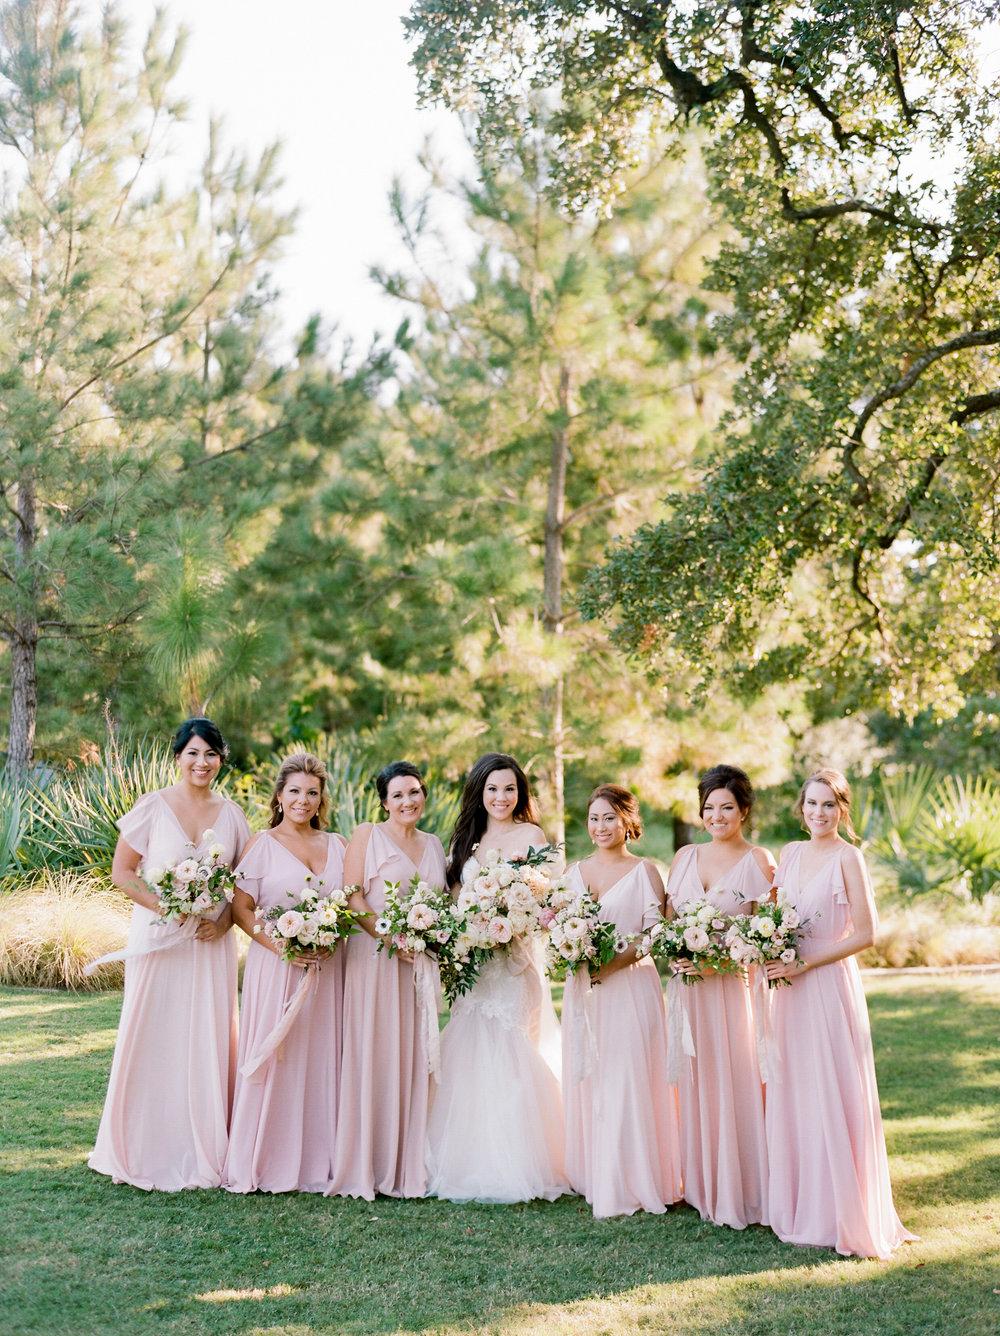 Martha-Stewart-Wedding-Dana-Fernandez-Photography-Josh-Texas-Film-Houston-Wedding-Fine-Art-Photographer-McGovern-Centennial-Gardens-Top-Best-21.jpg